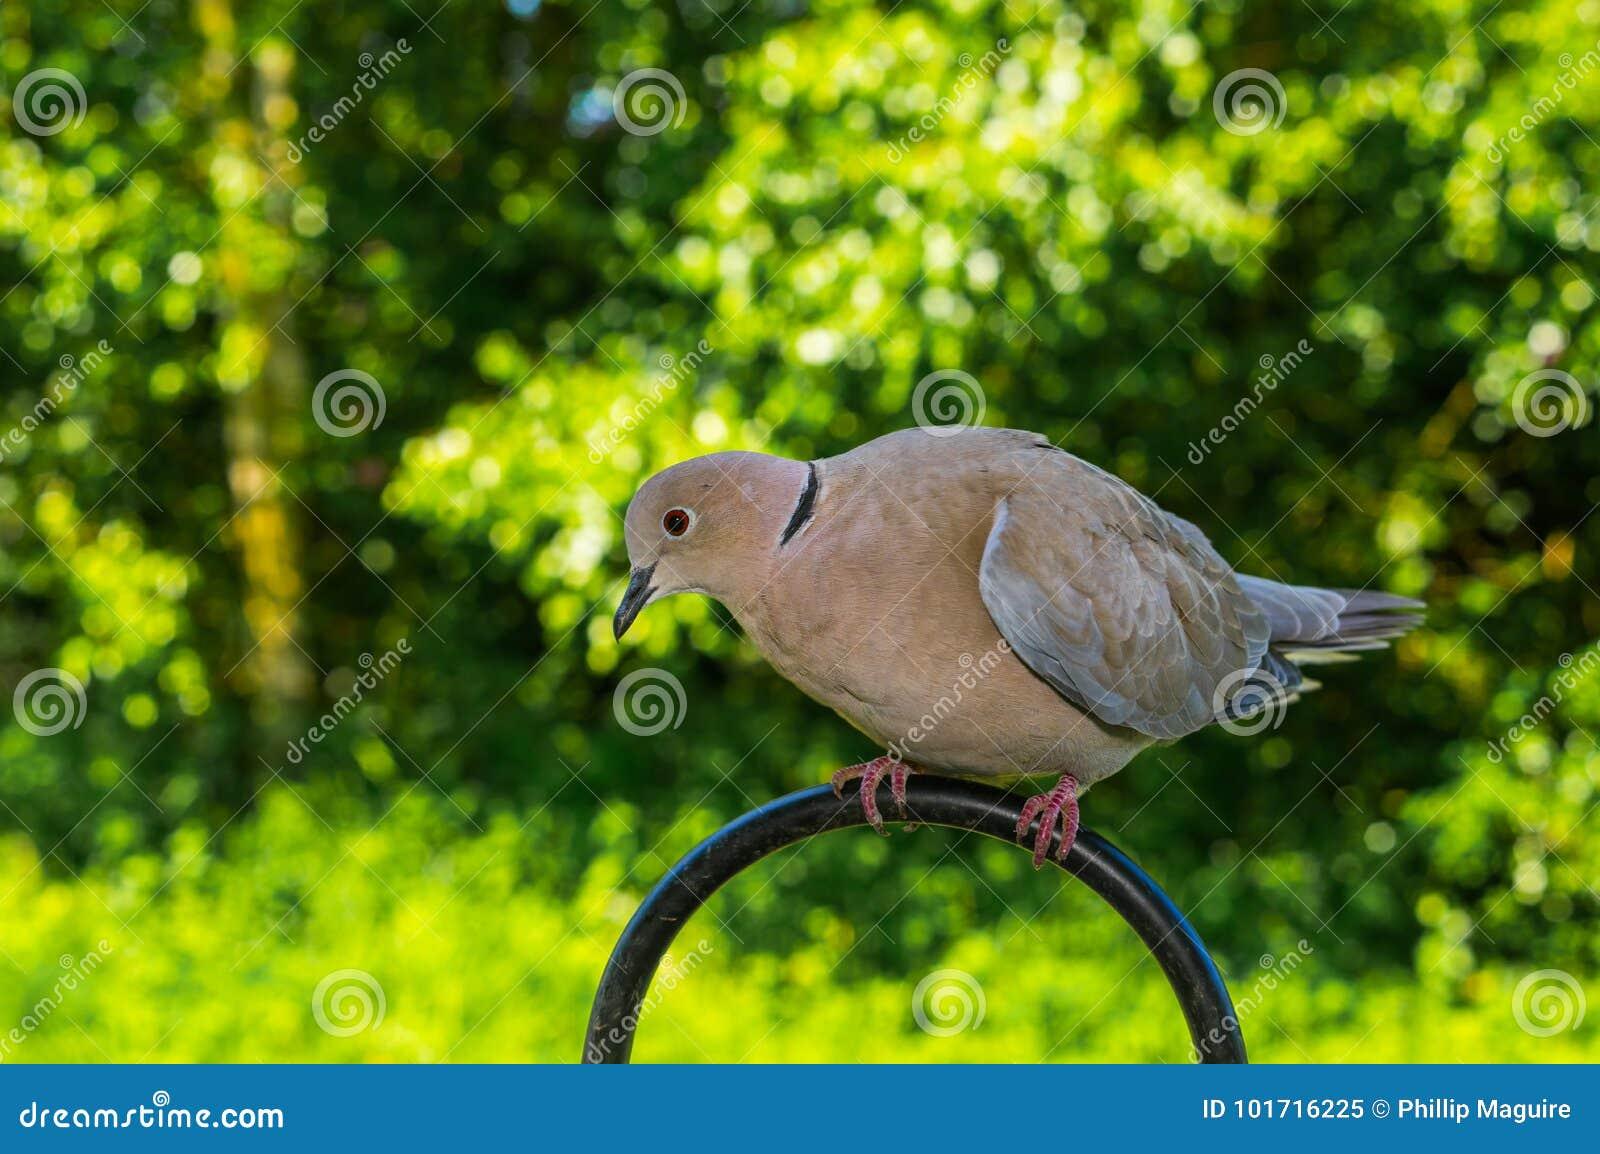 Collared Dove in garden stock image  Image of avian - 101716225